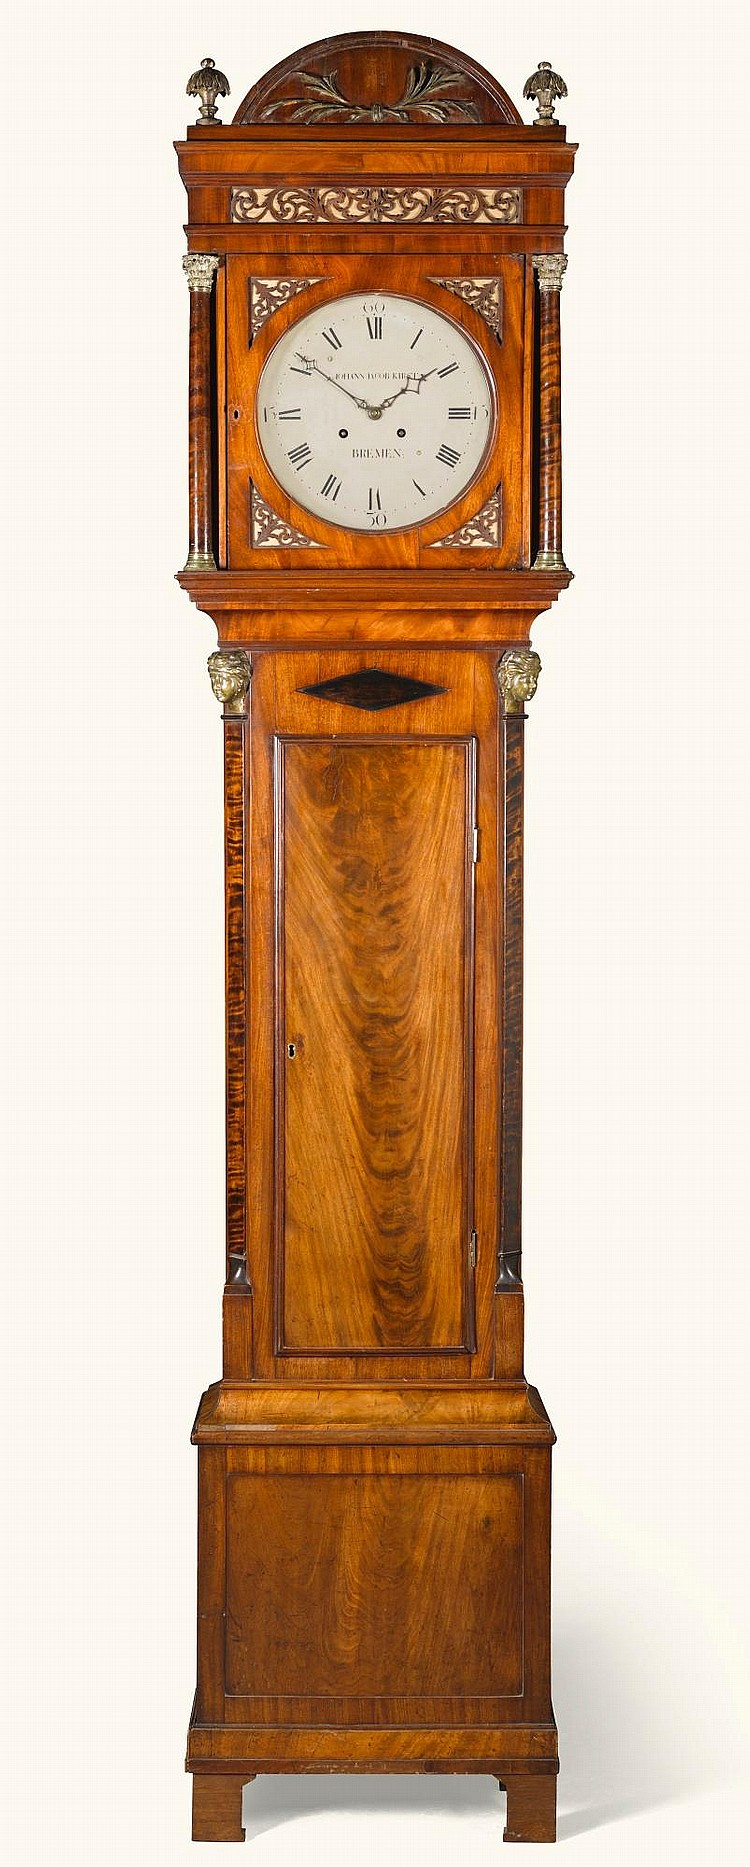 ANORTH GERMAN DUTCH-STRIKINGNEO-CLASSICAL MAHOGANY LONGCASE CLOCK, JOHANN JACOB KIRST, BREMEN, CIRCA 1810 |